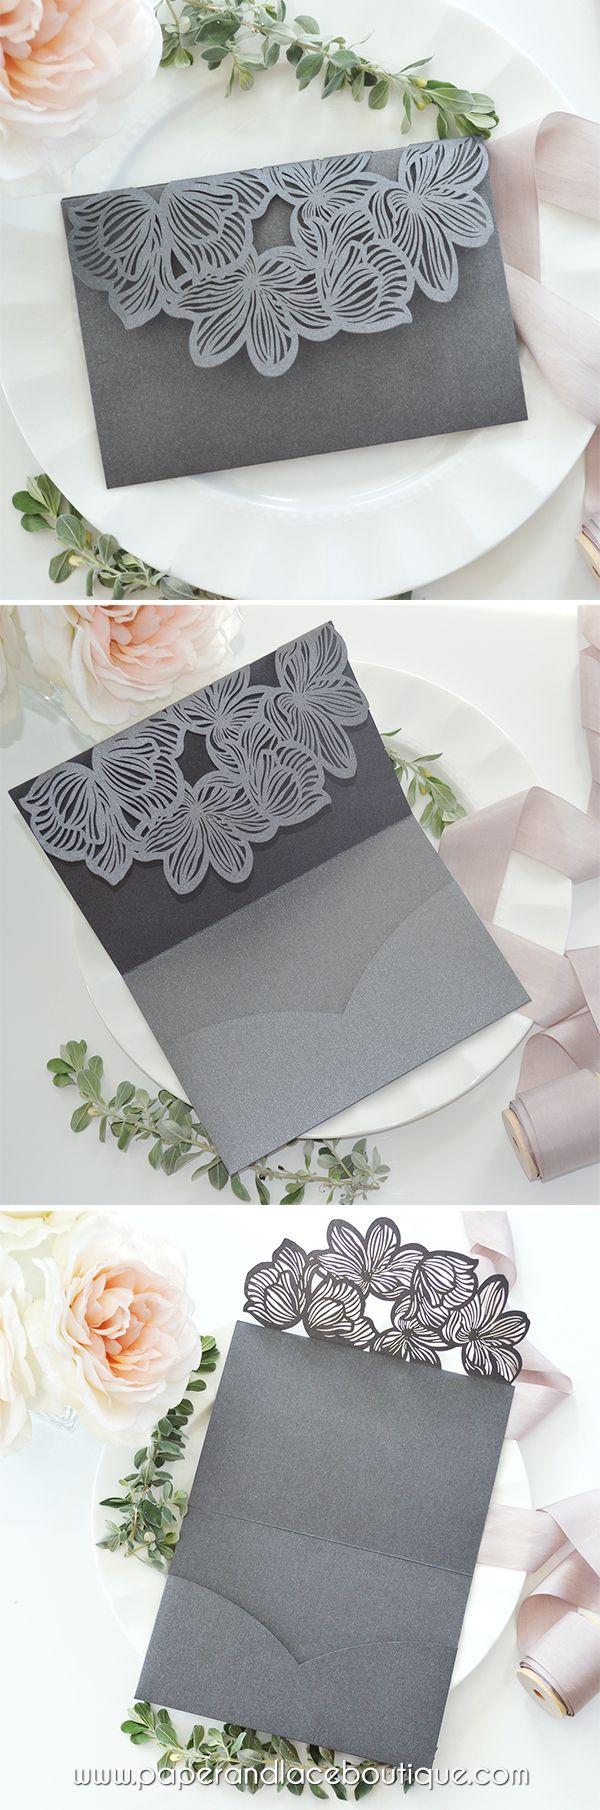 Diy laser cut flower trifold pocket invitation laser cut wedding